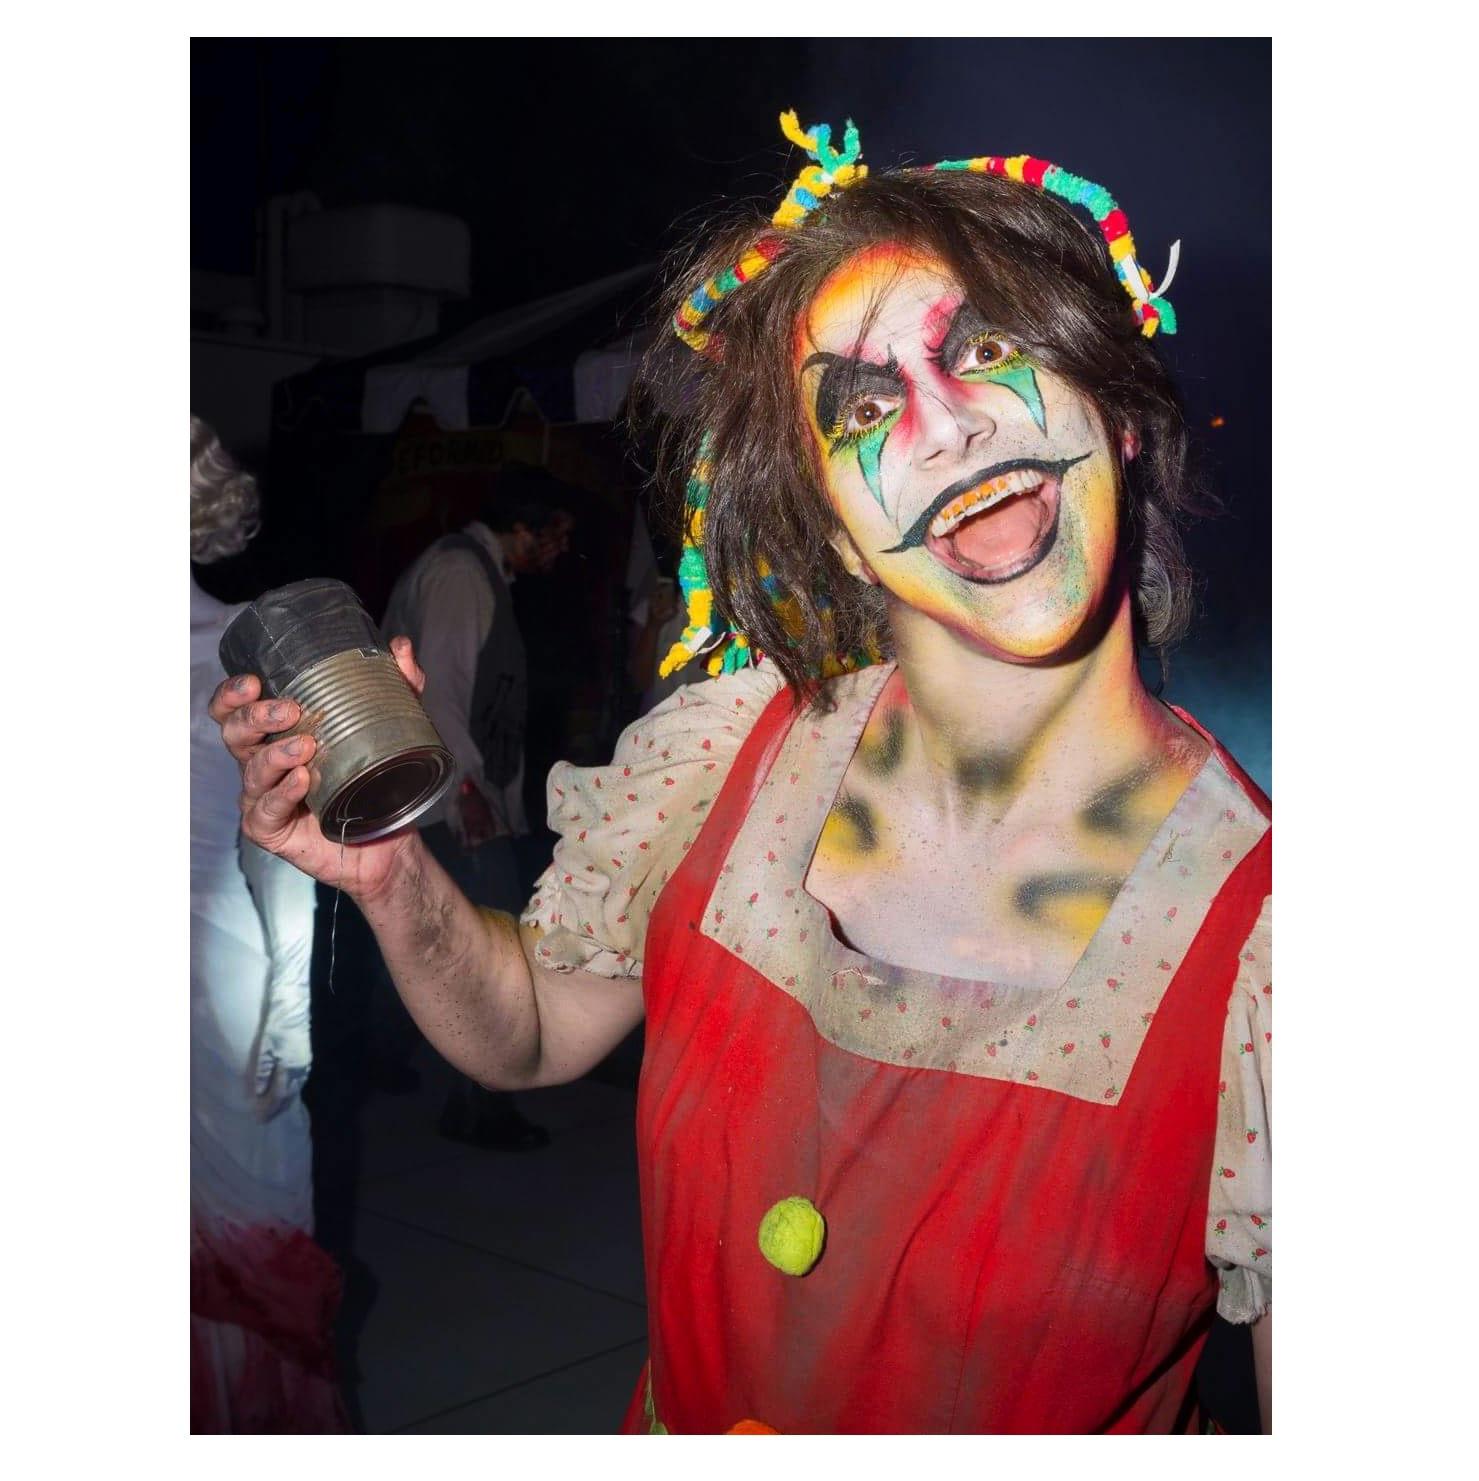 Adrienne_Whitney_Papp_Sinister_Circus_Midsummer_Scream_2017_Queen_Mary_Dark_Harbor_2.jpg